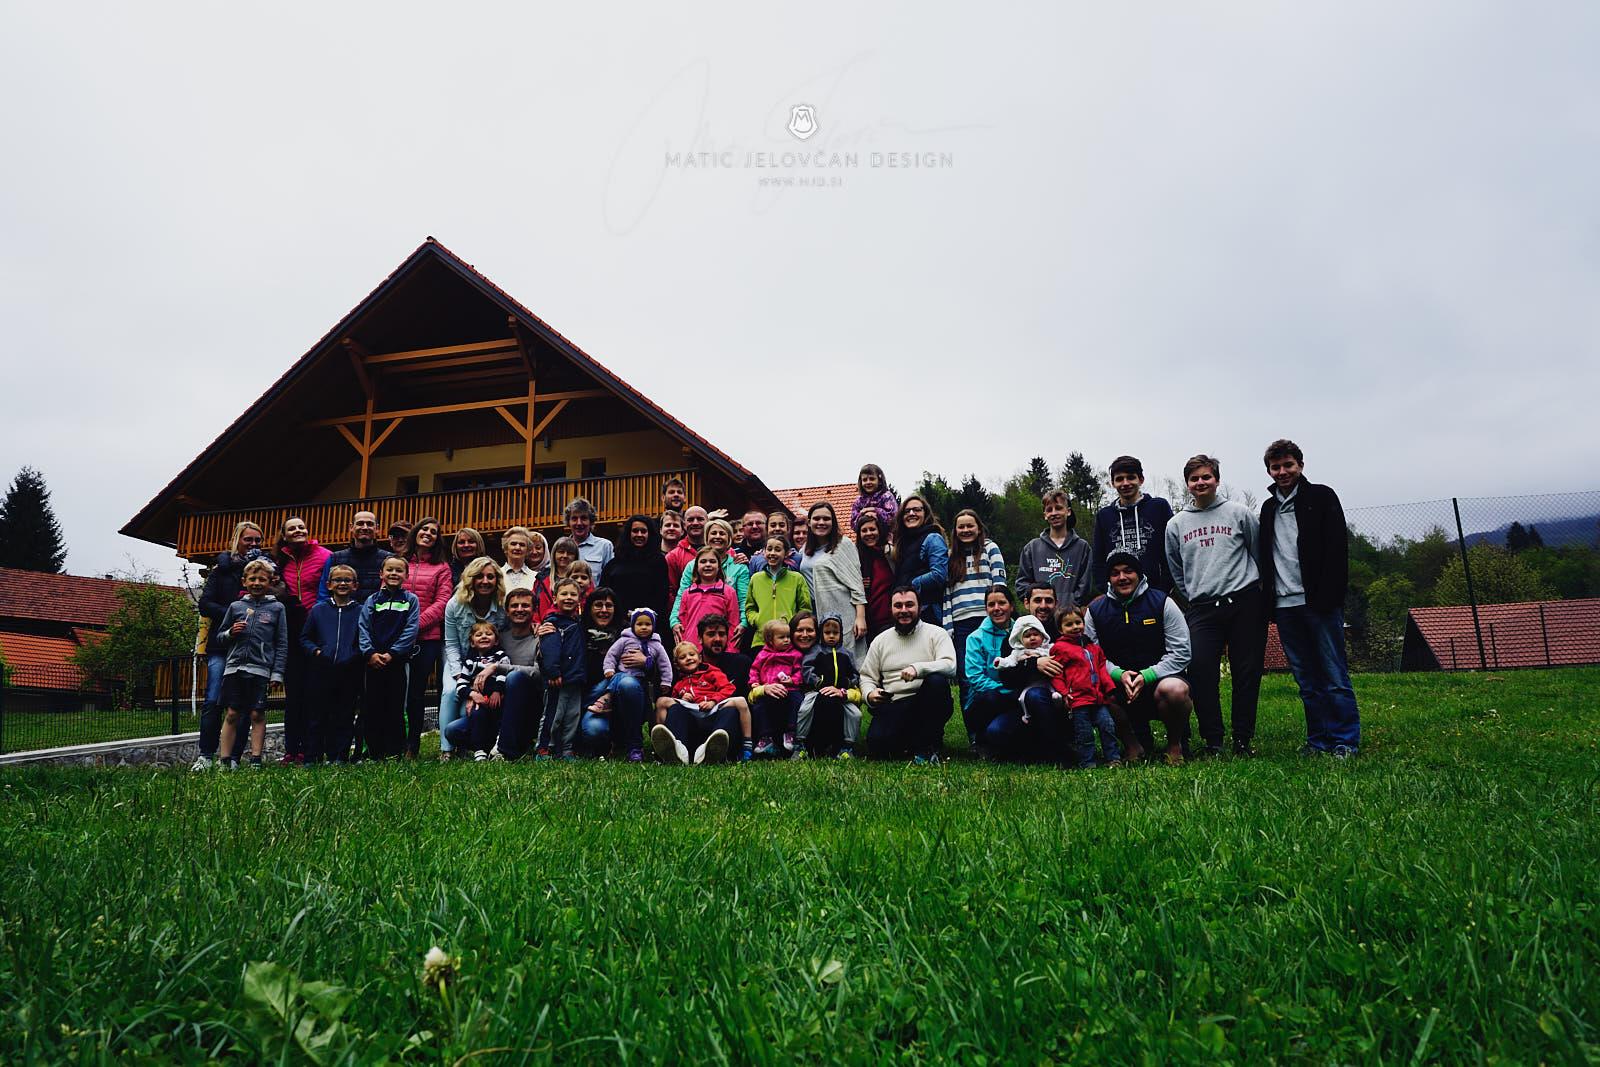 2017 04 23 09.37.44 DSC00016 small - Cerkveni oddih, EKC Radovljica v Osilnici